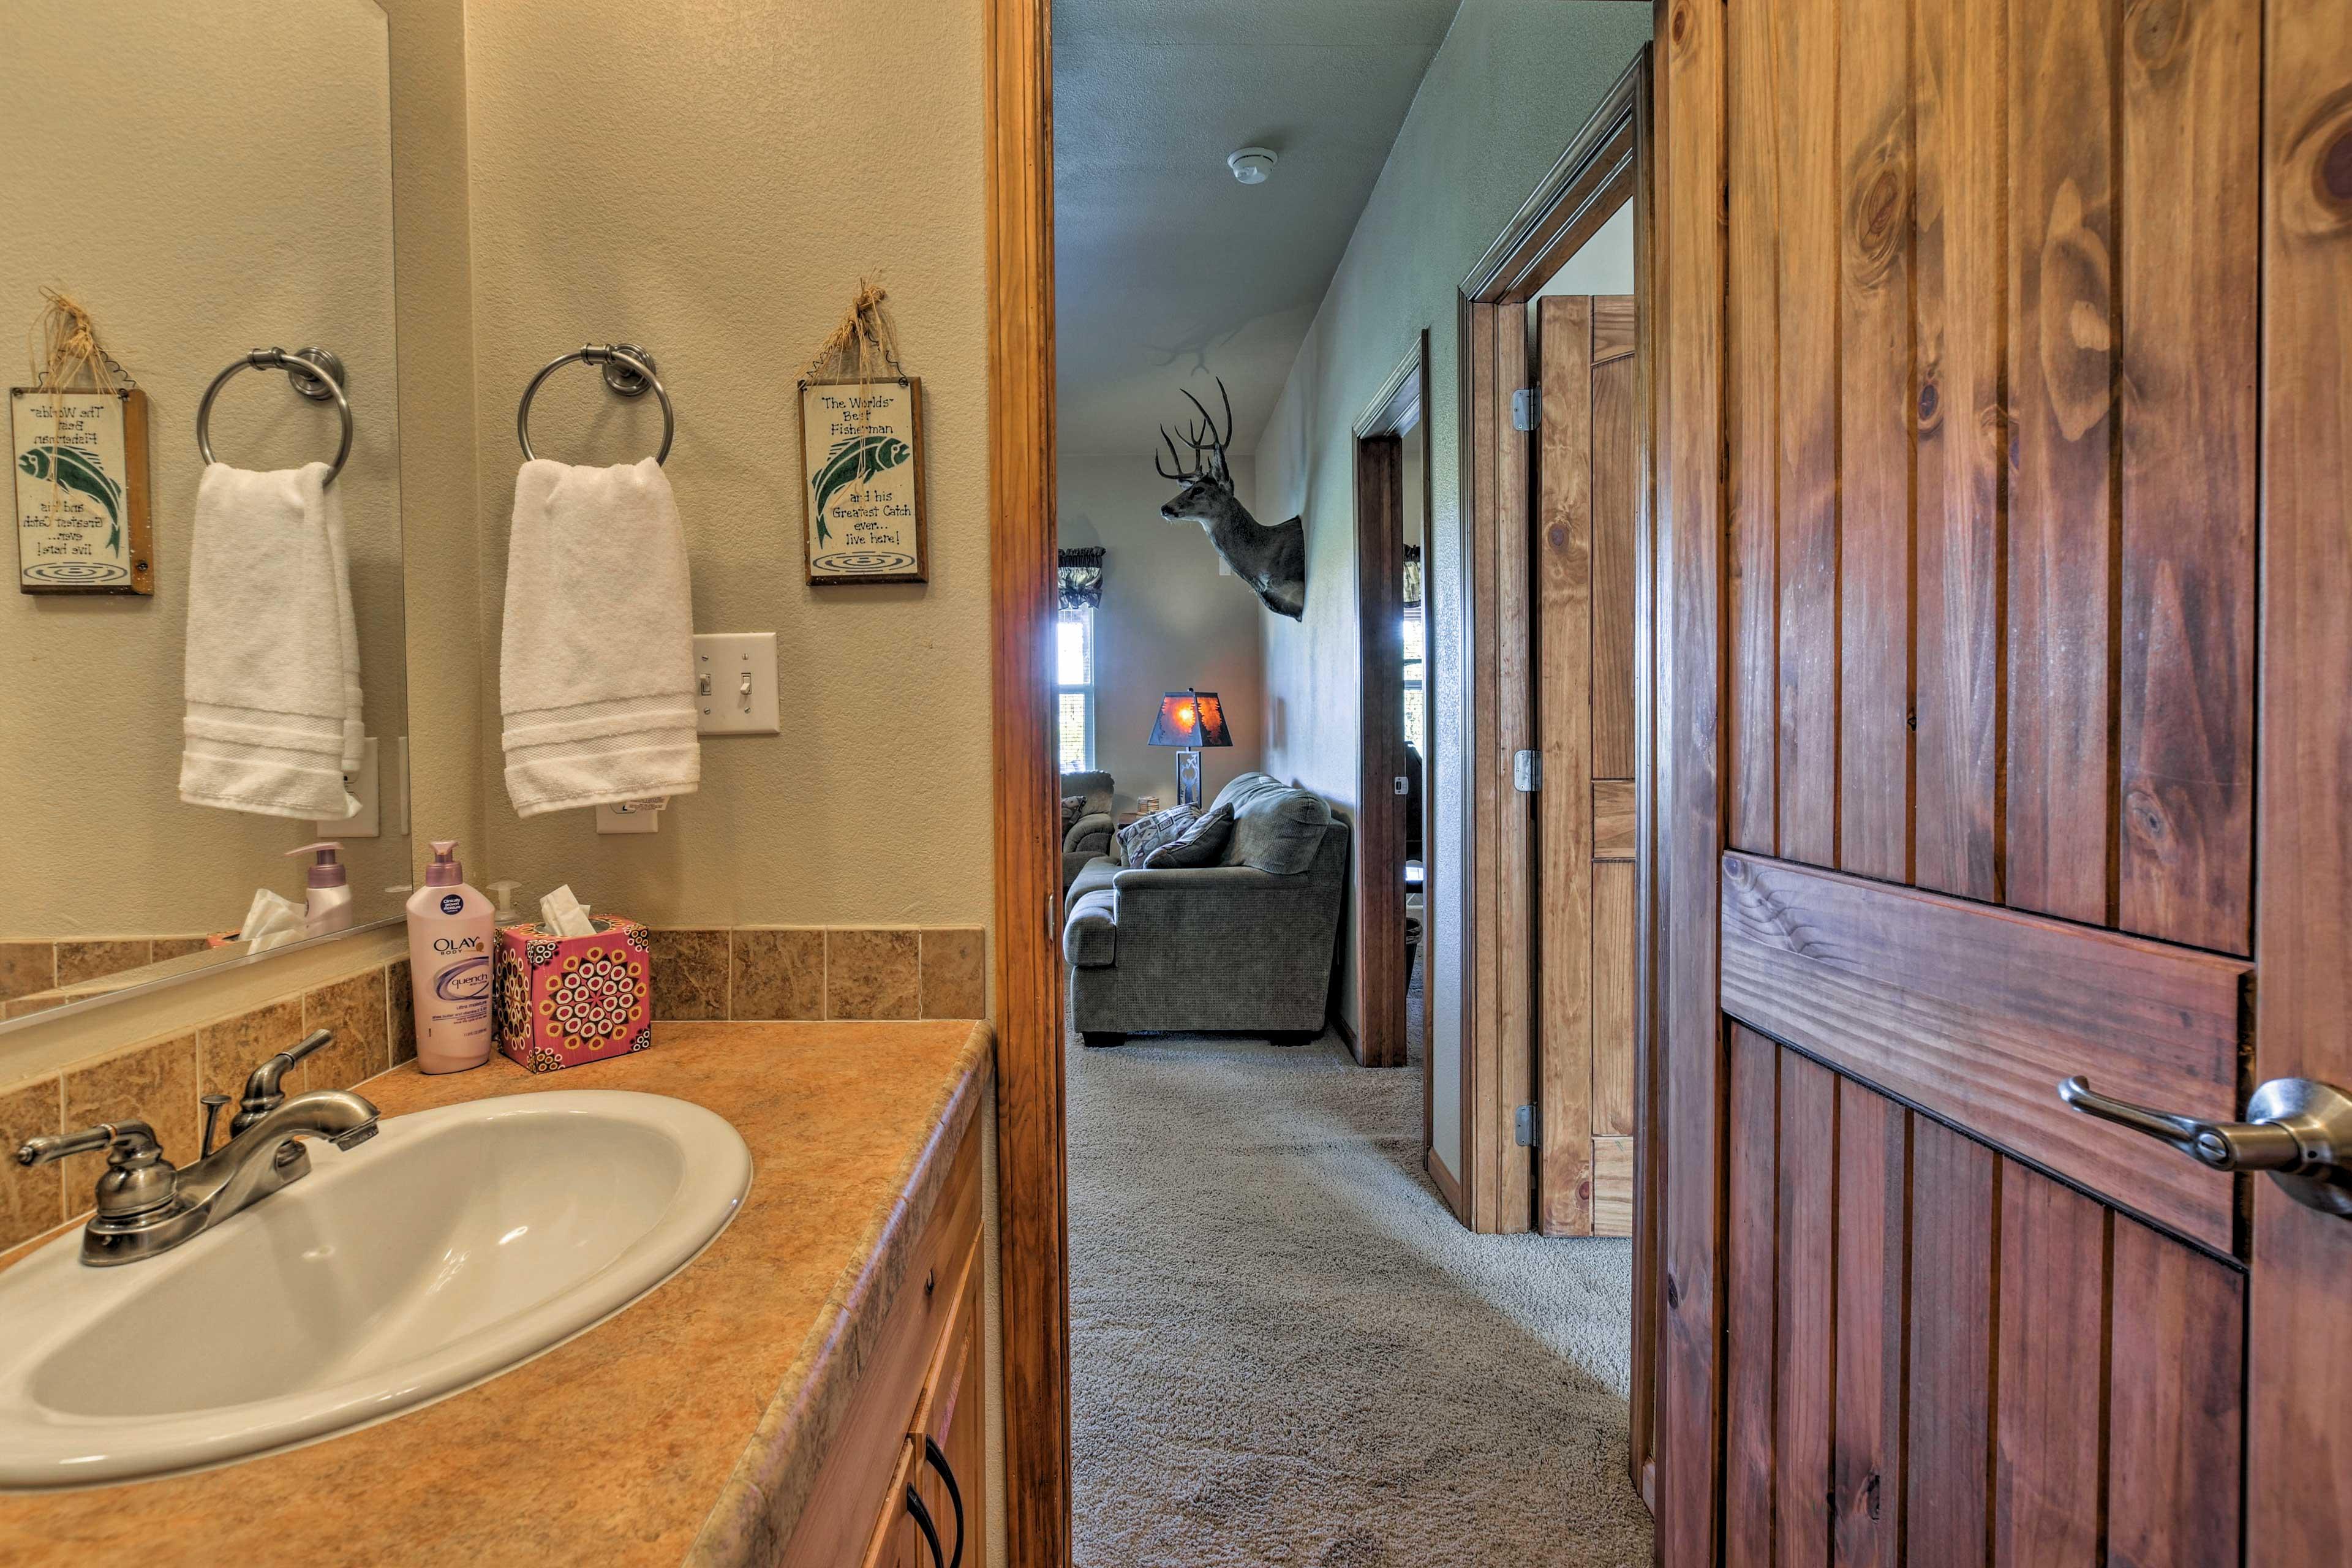 Two bathrooms provide plenty of privacy.